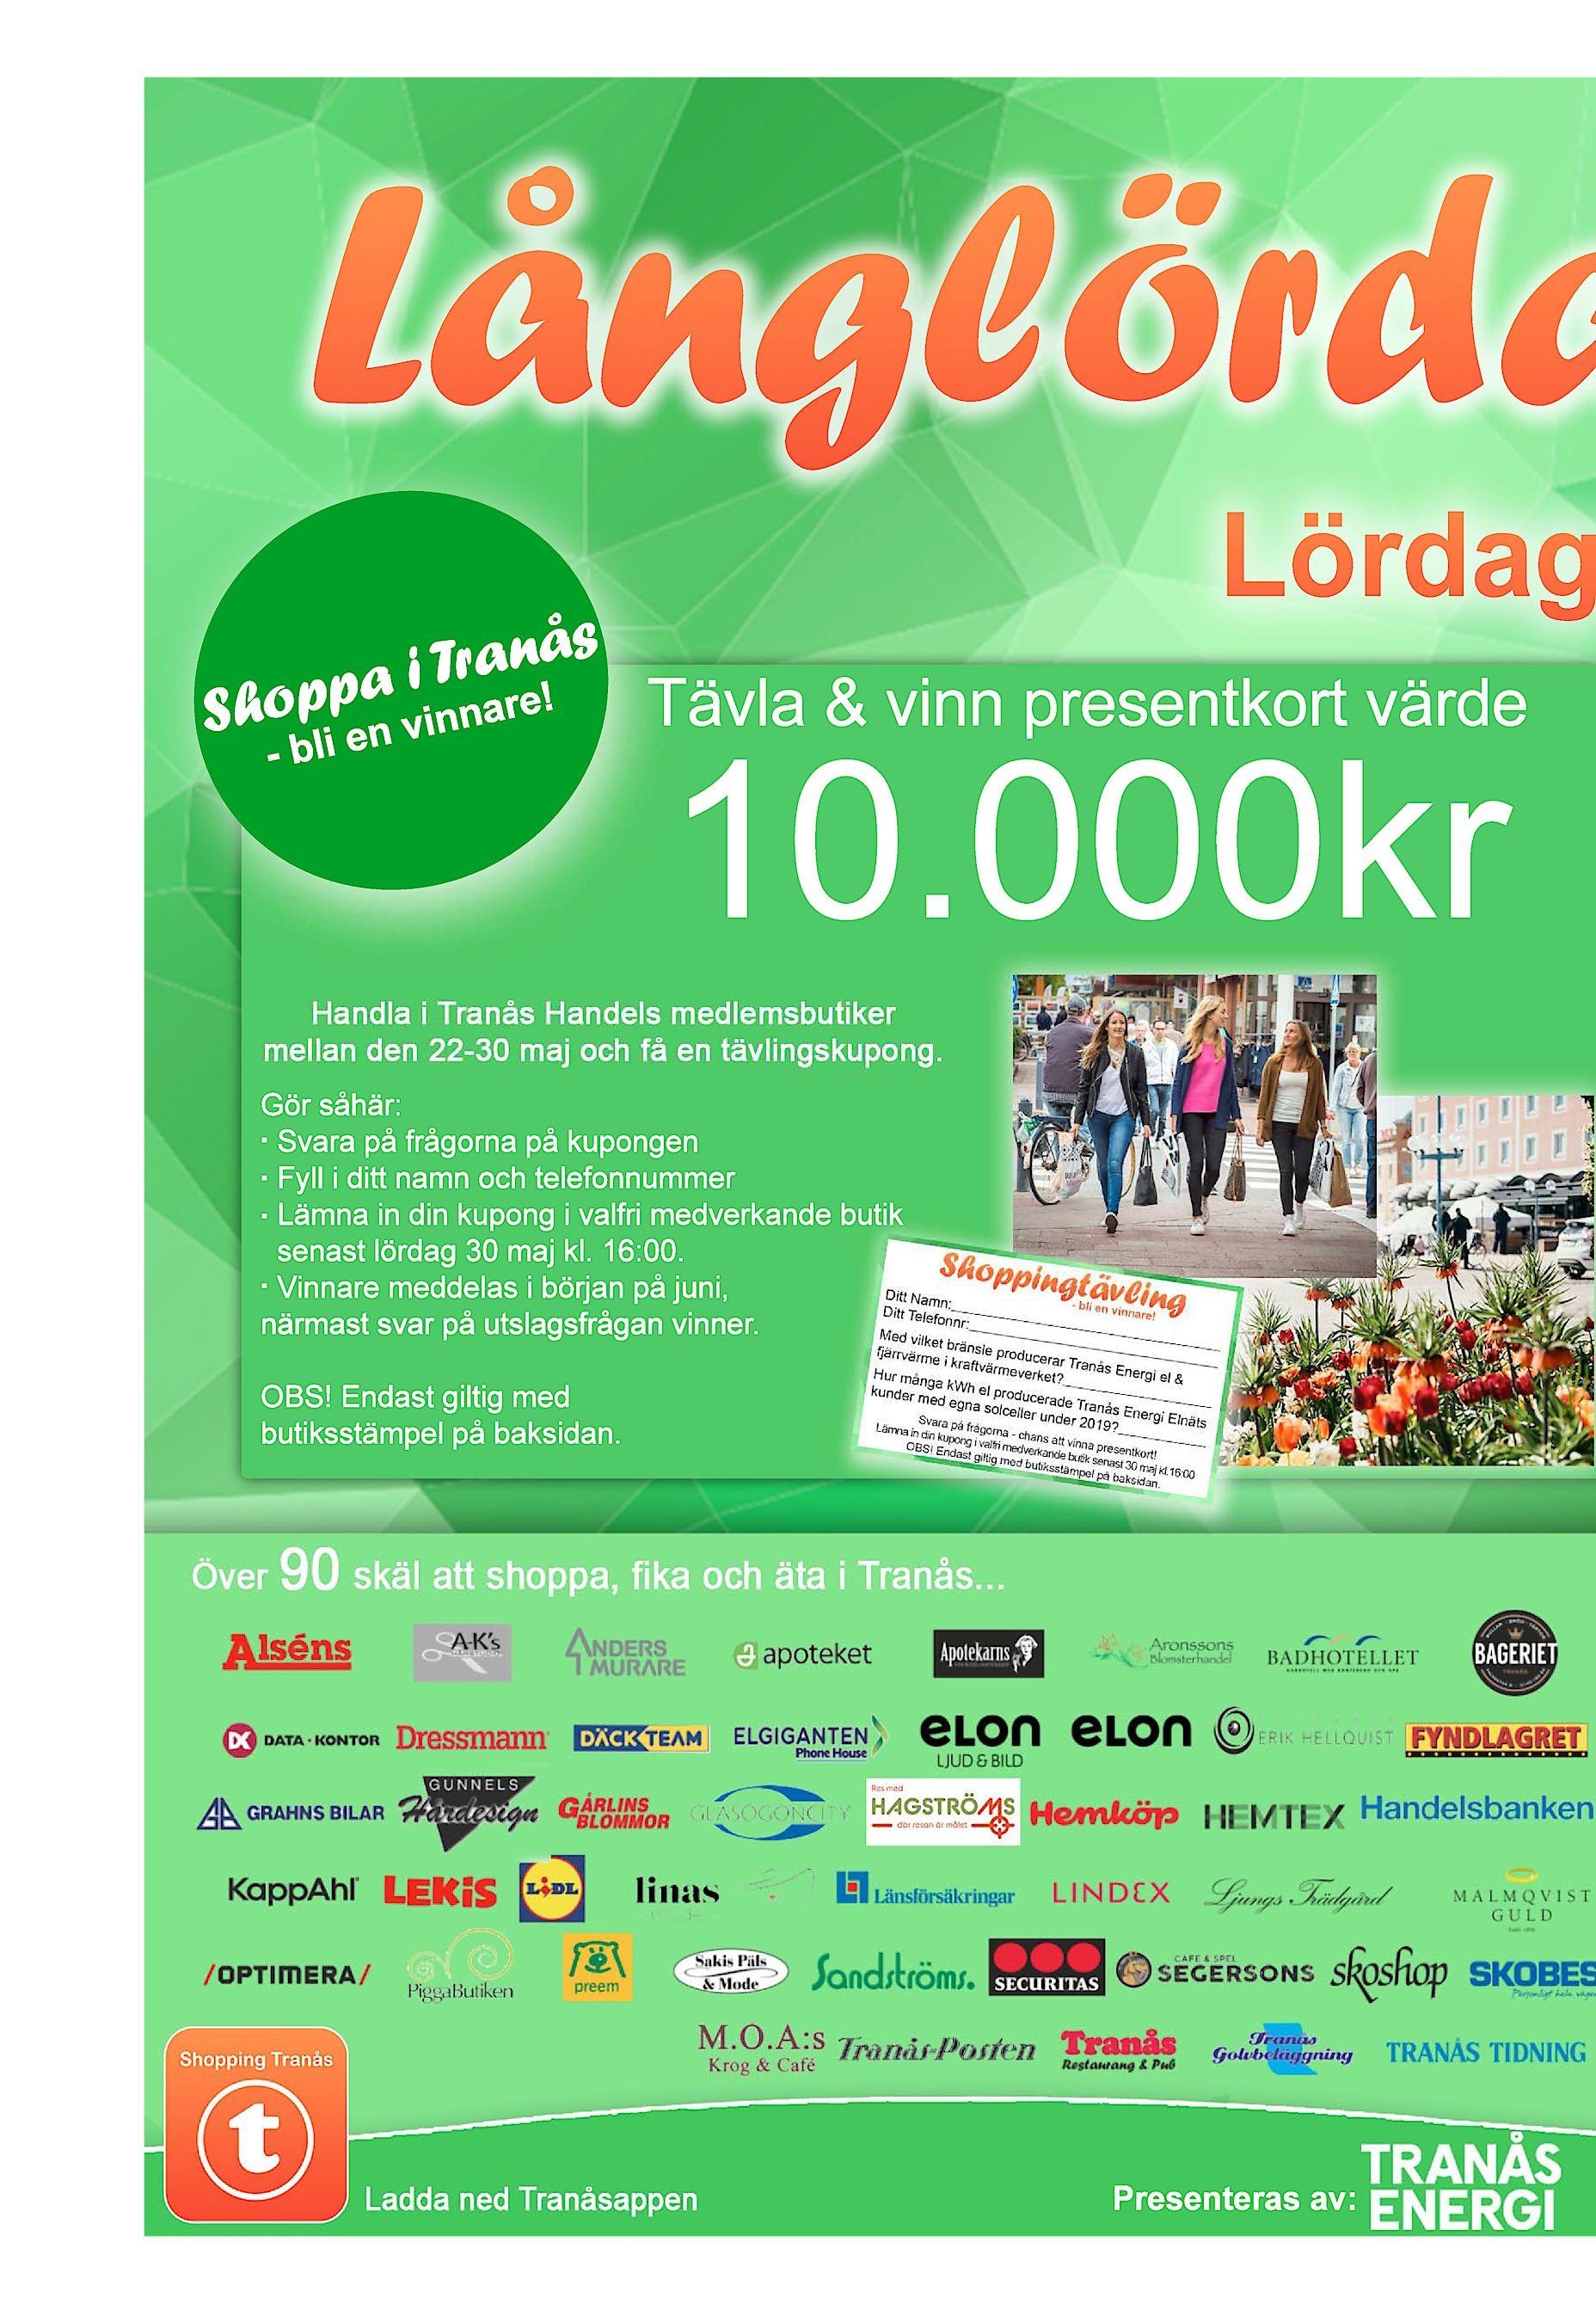 Bostad - garagesale24.net - Nyheter Linkping stergtland